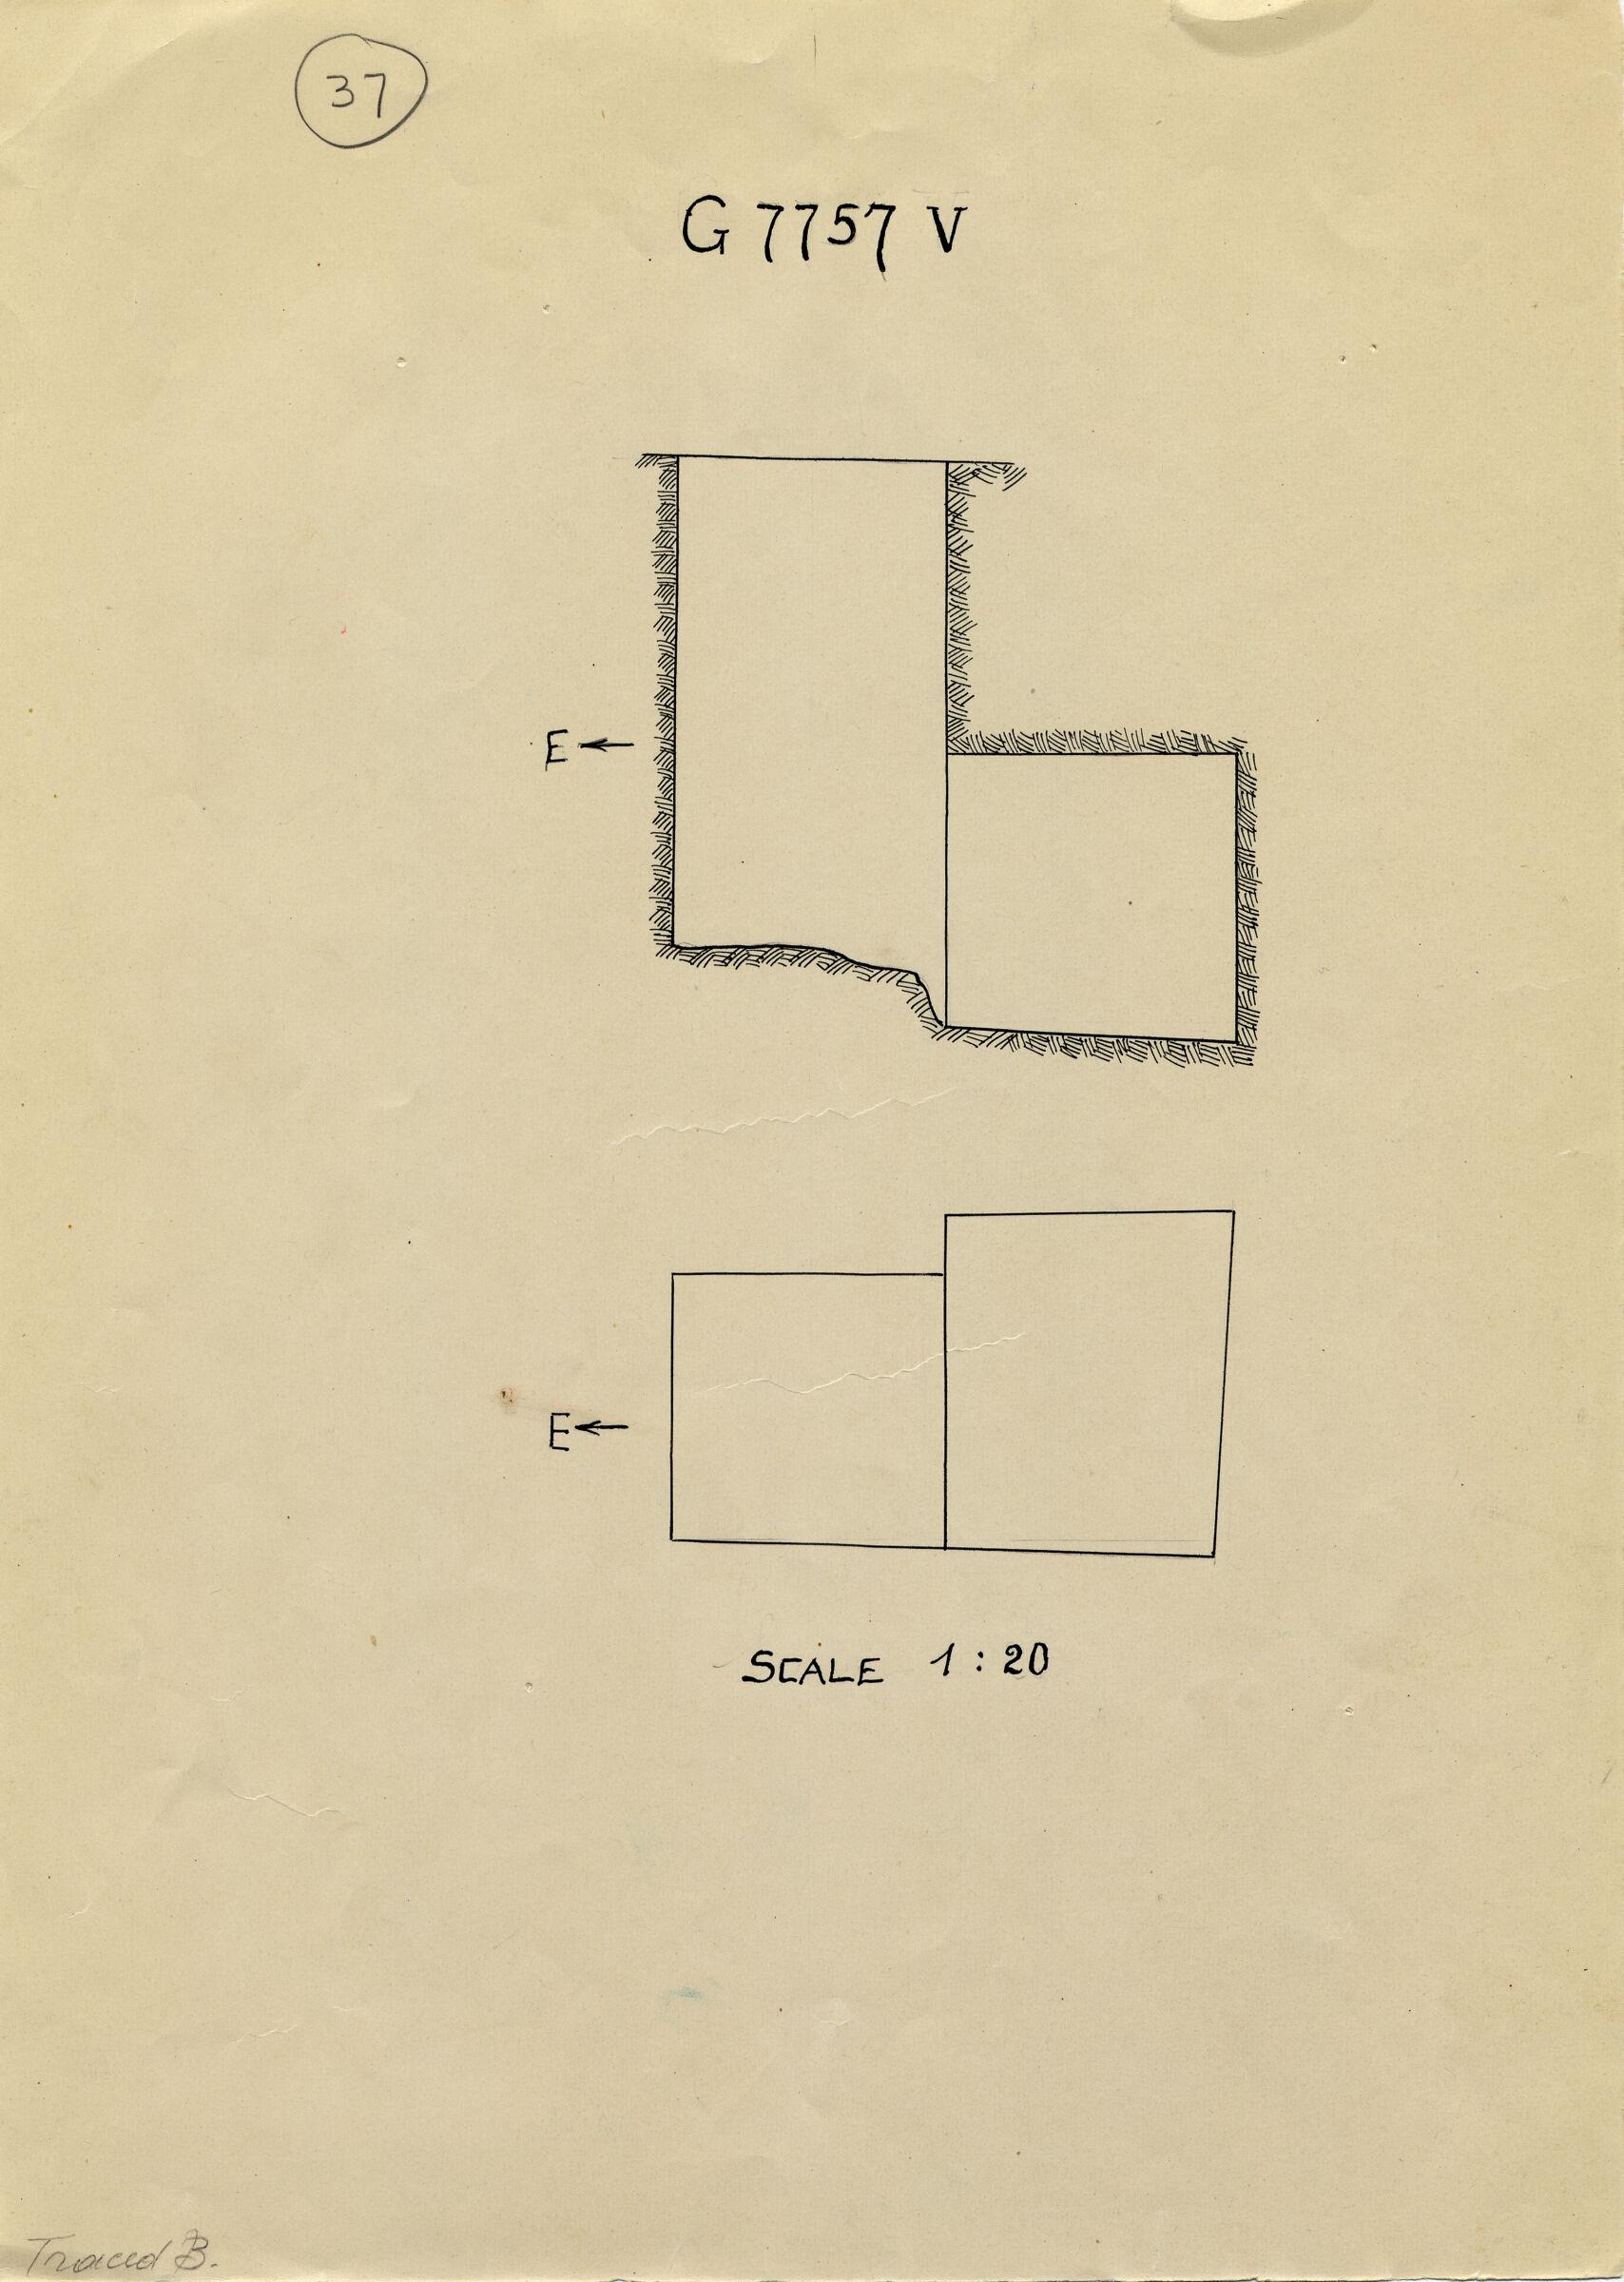 Maps and plans: G 7757, Shaft V